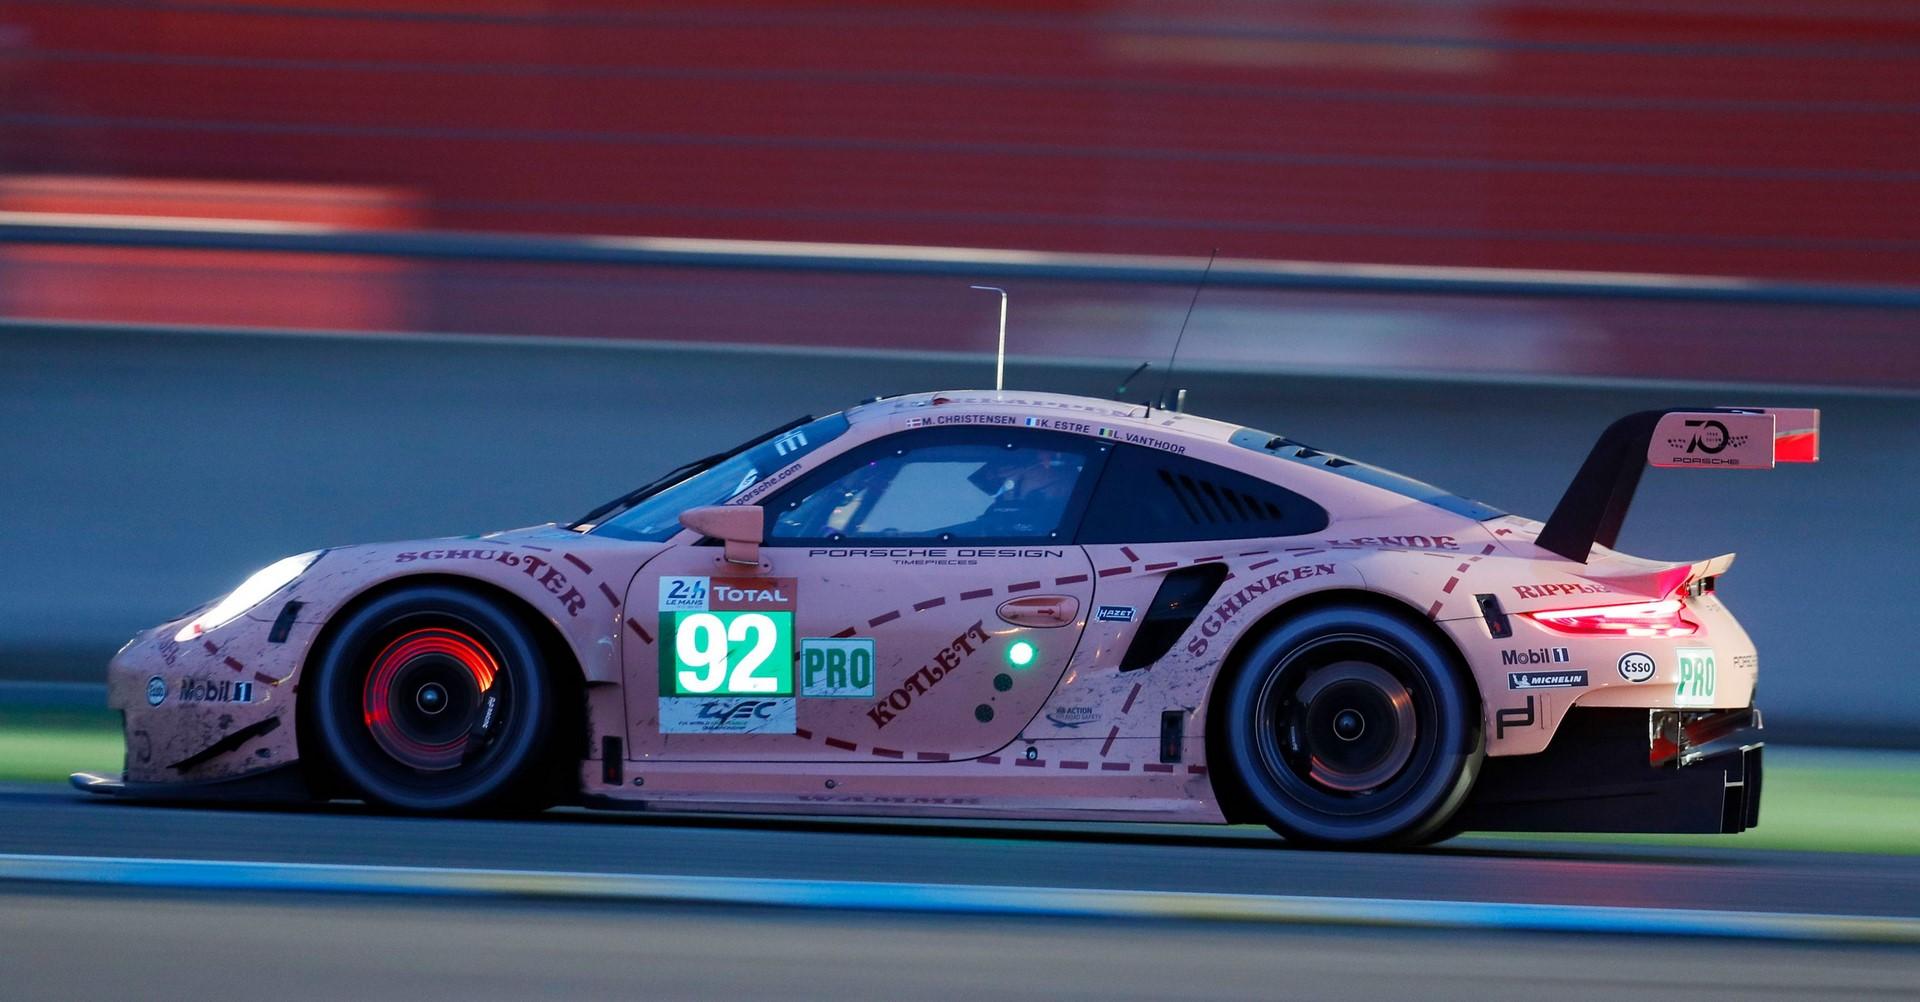 Le-Mans-2018-41-e1529294405542